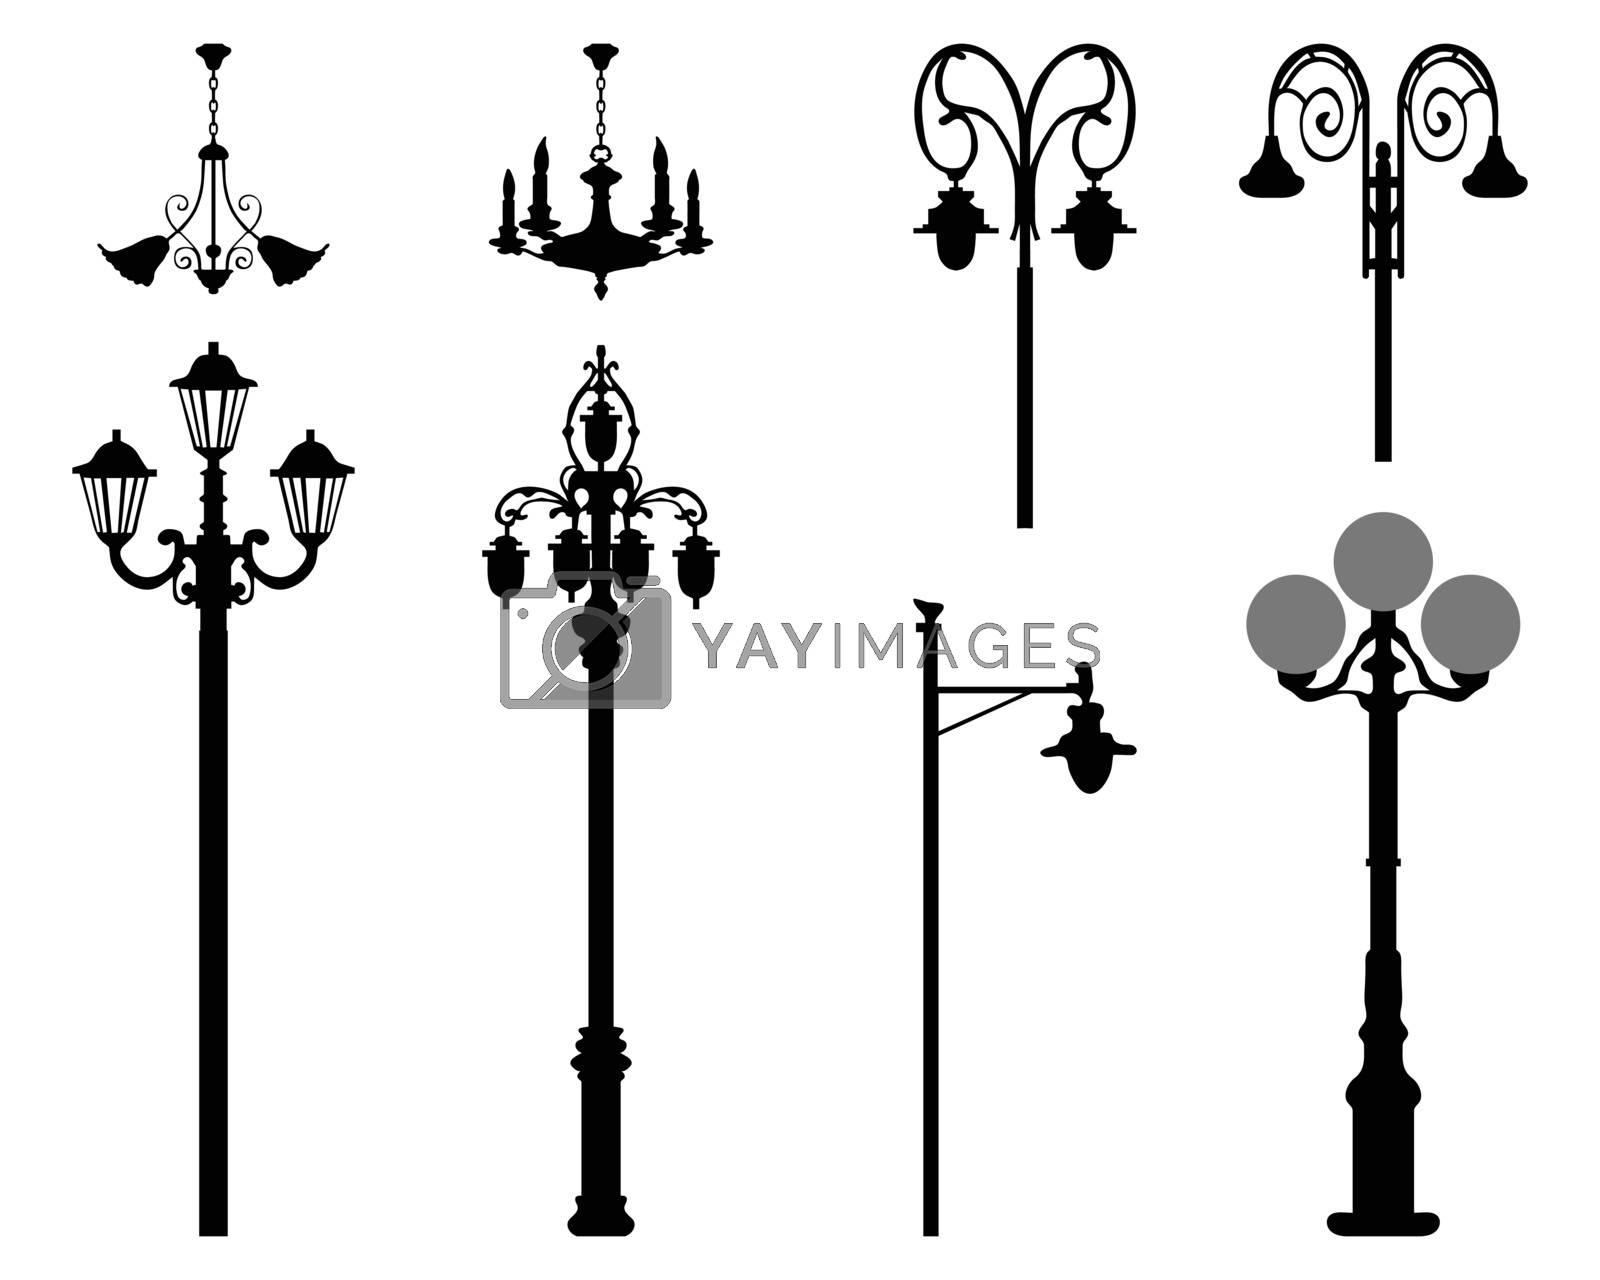 Black silhouettes of city street lanterns on a white background